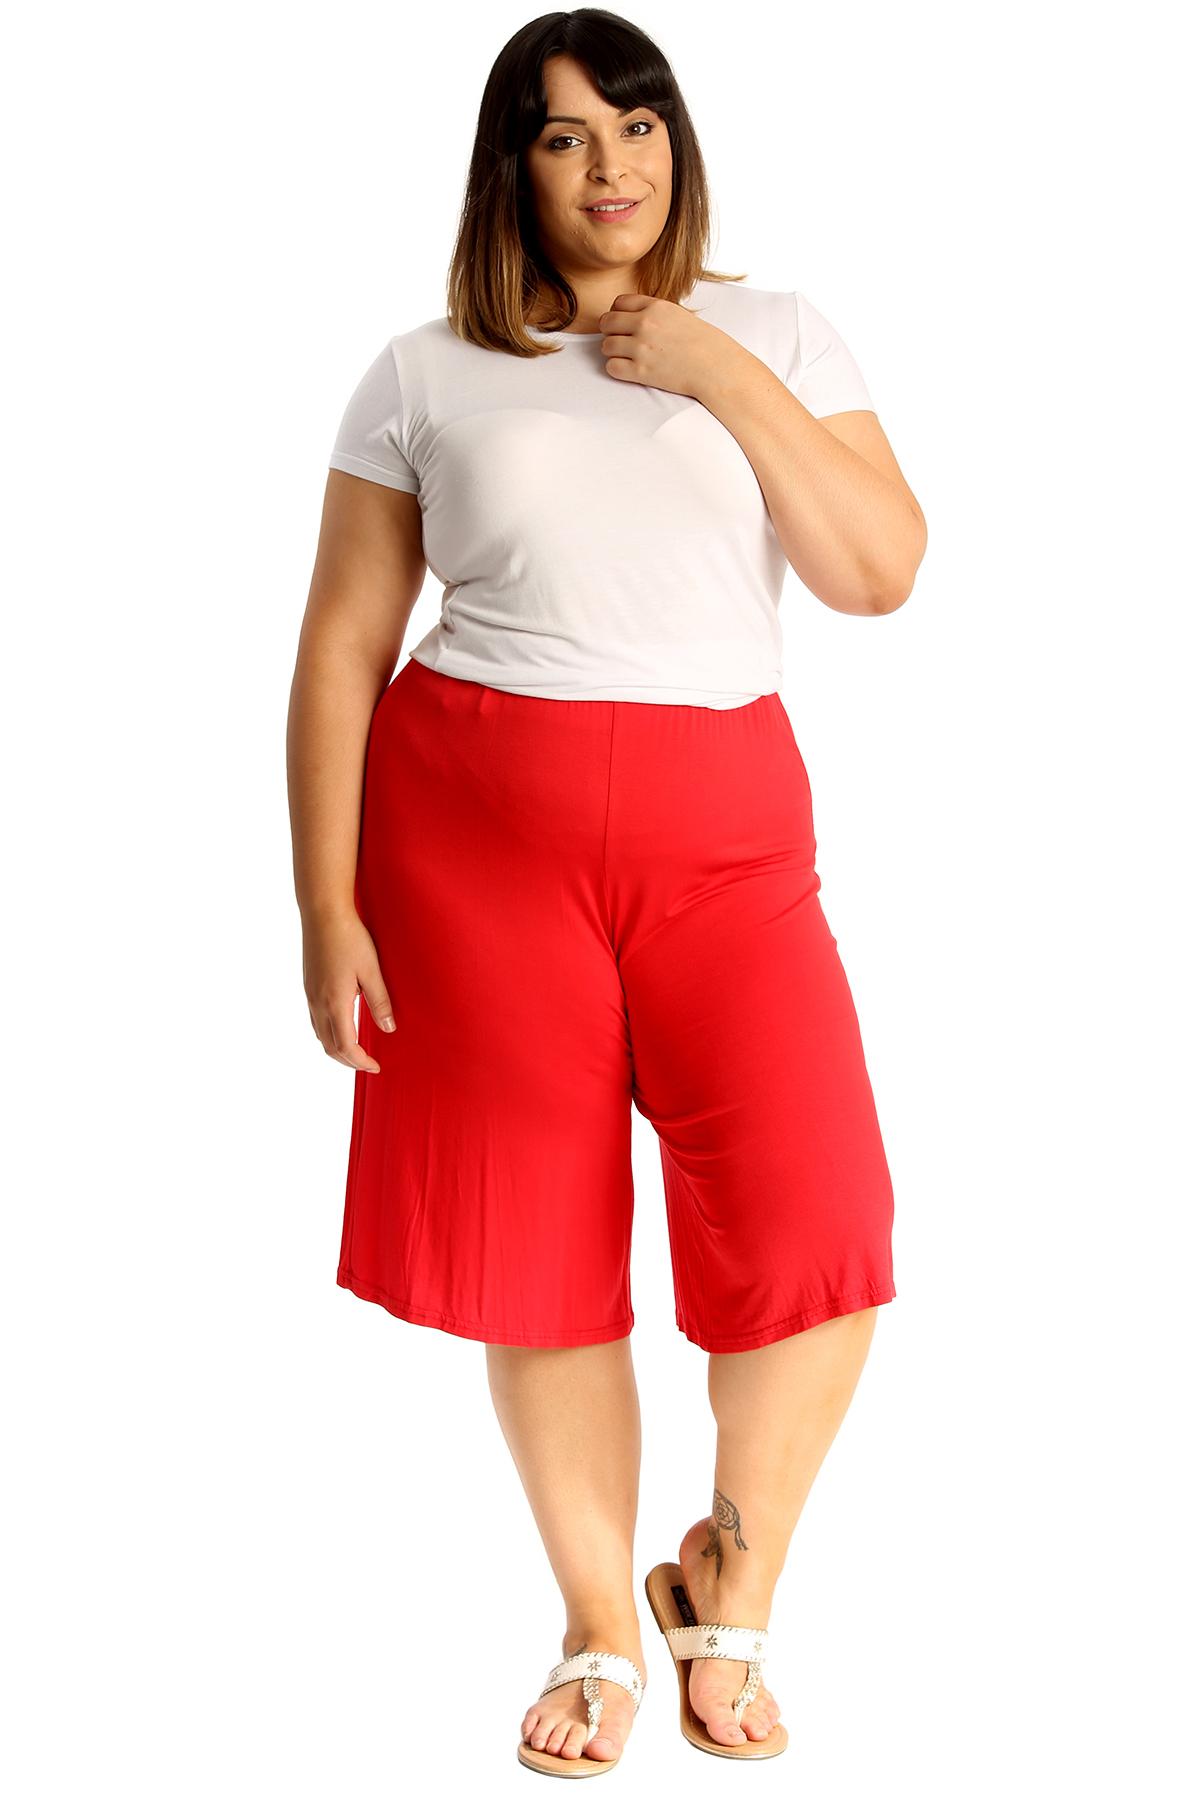 New-Womens-Plus-Size-Culottes-Ladies-Plain-Shorts-Palazzo-Elastic-Pants-Summer thumbnail 34